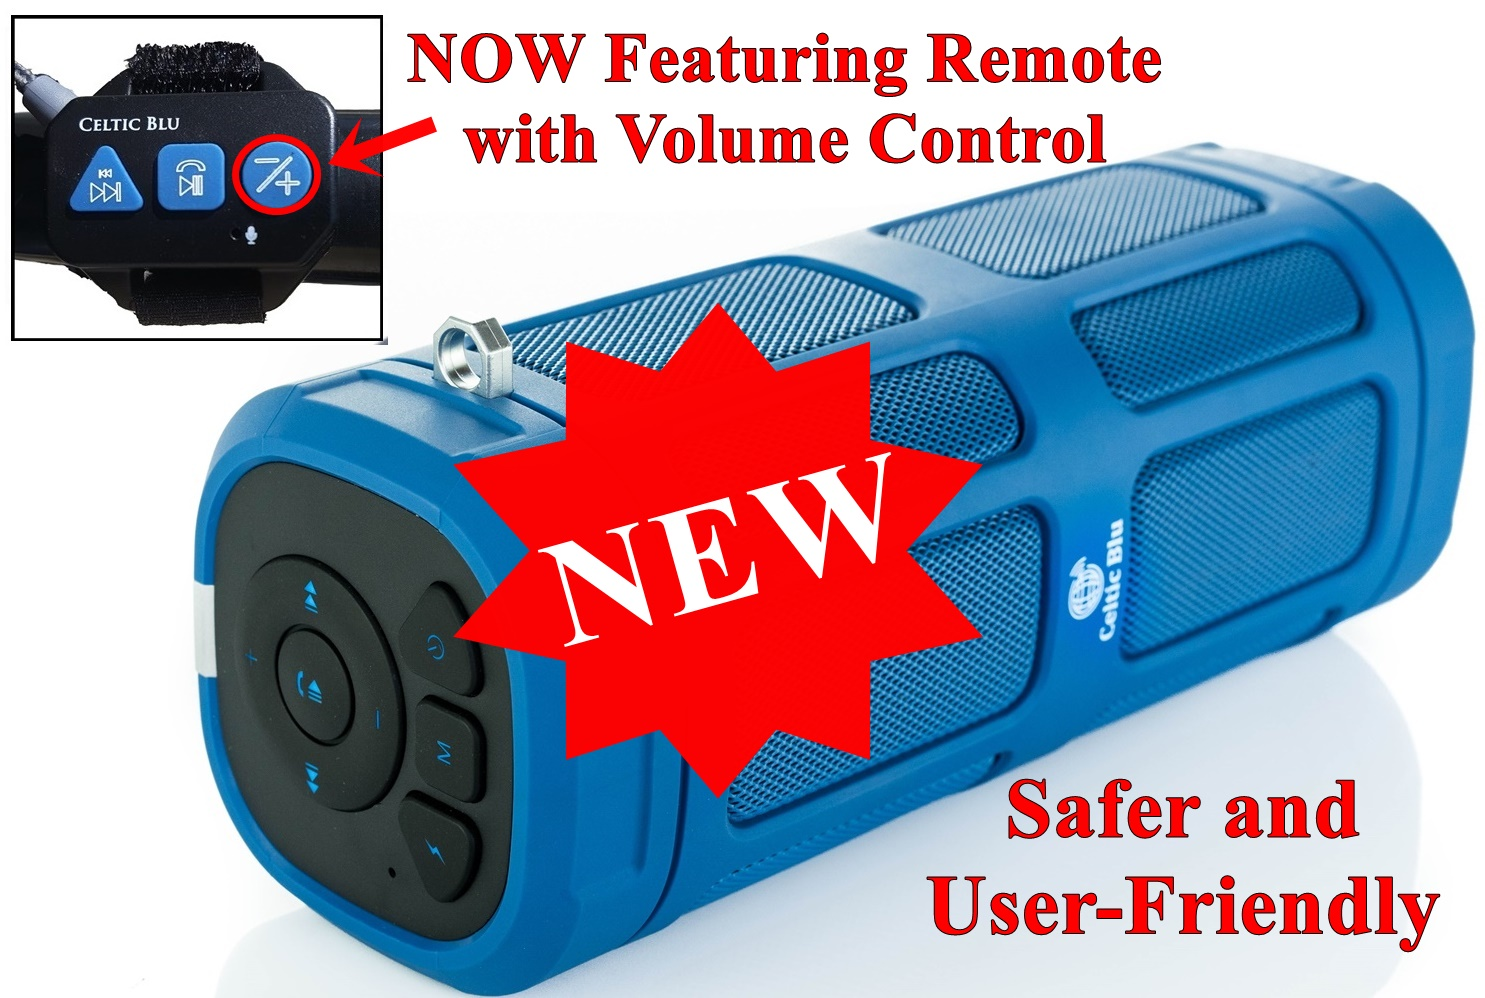 remote 1500 user-friendly 2019.jpg